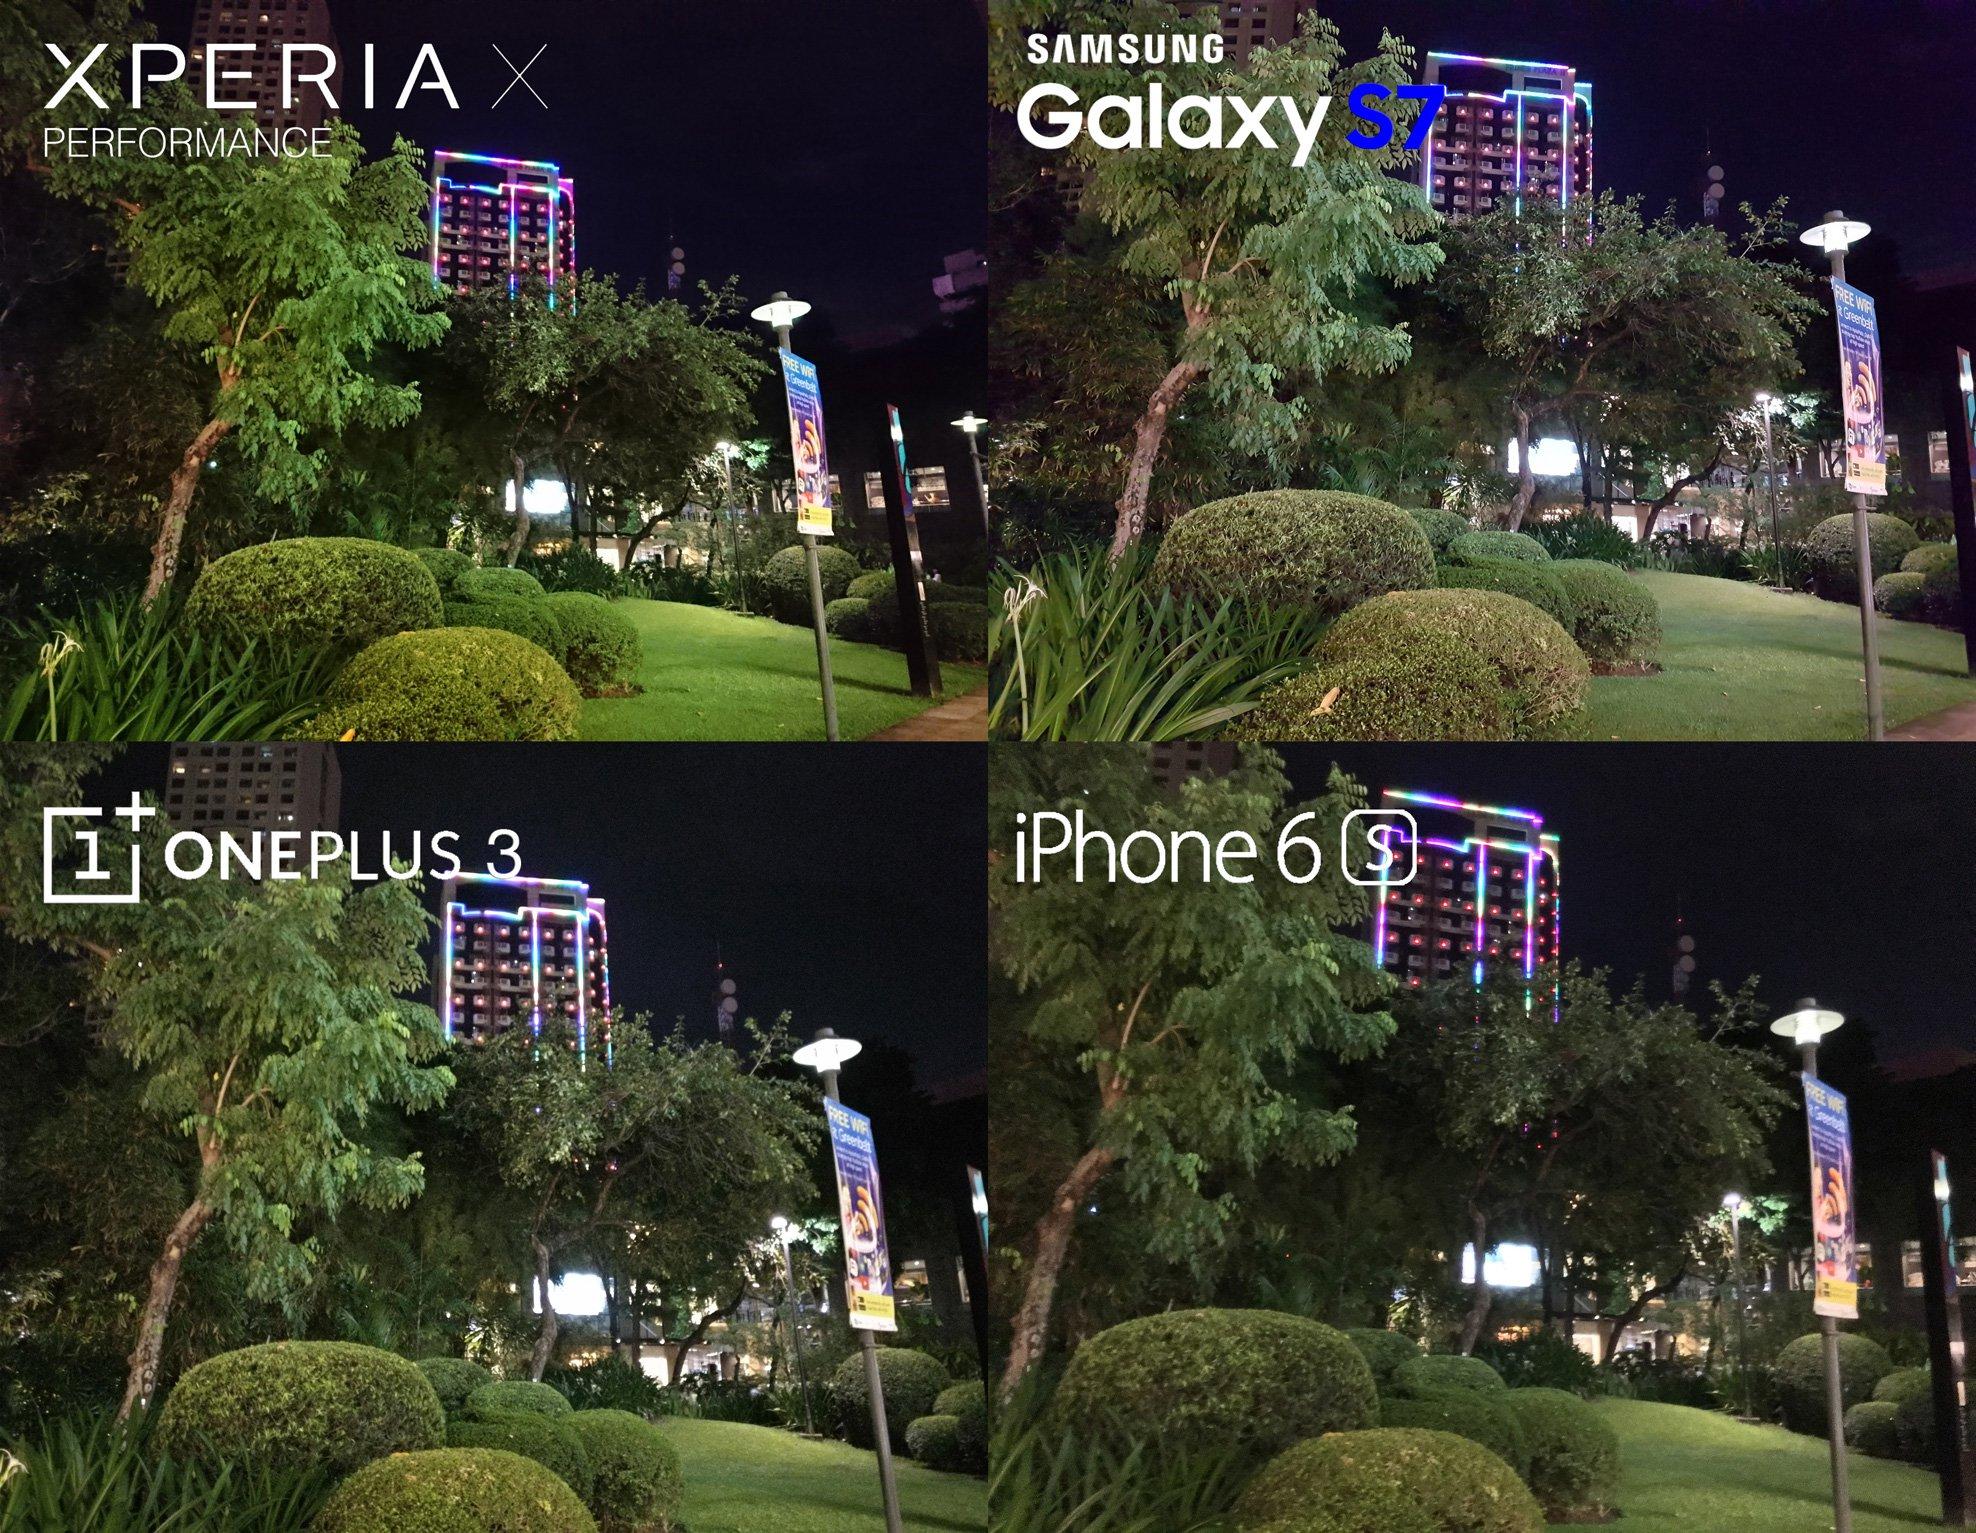 Camera Review Sony Xperia X Performance Samsung Galaxy S7